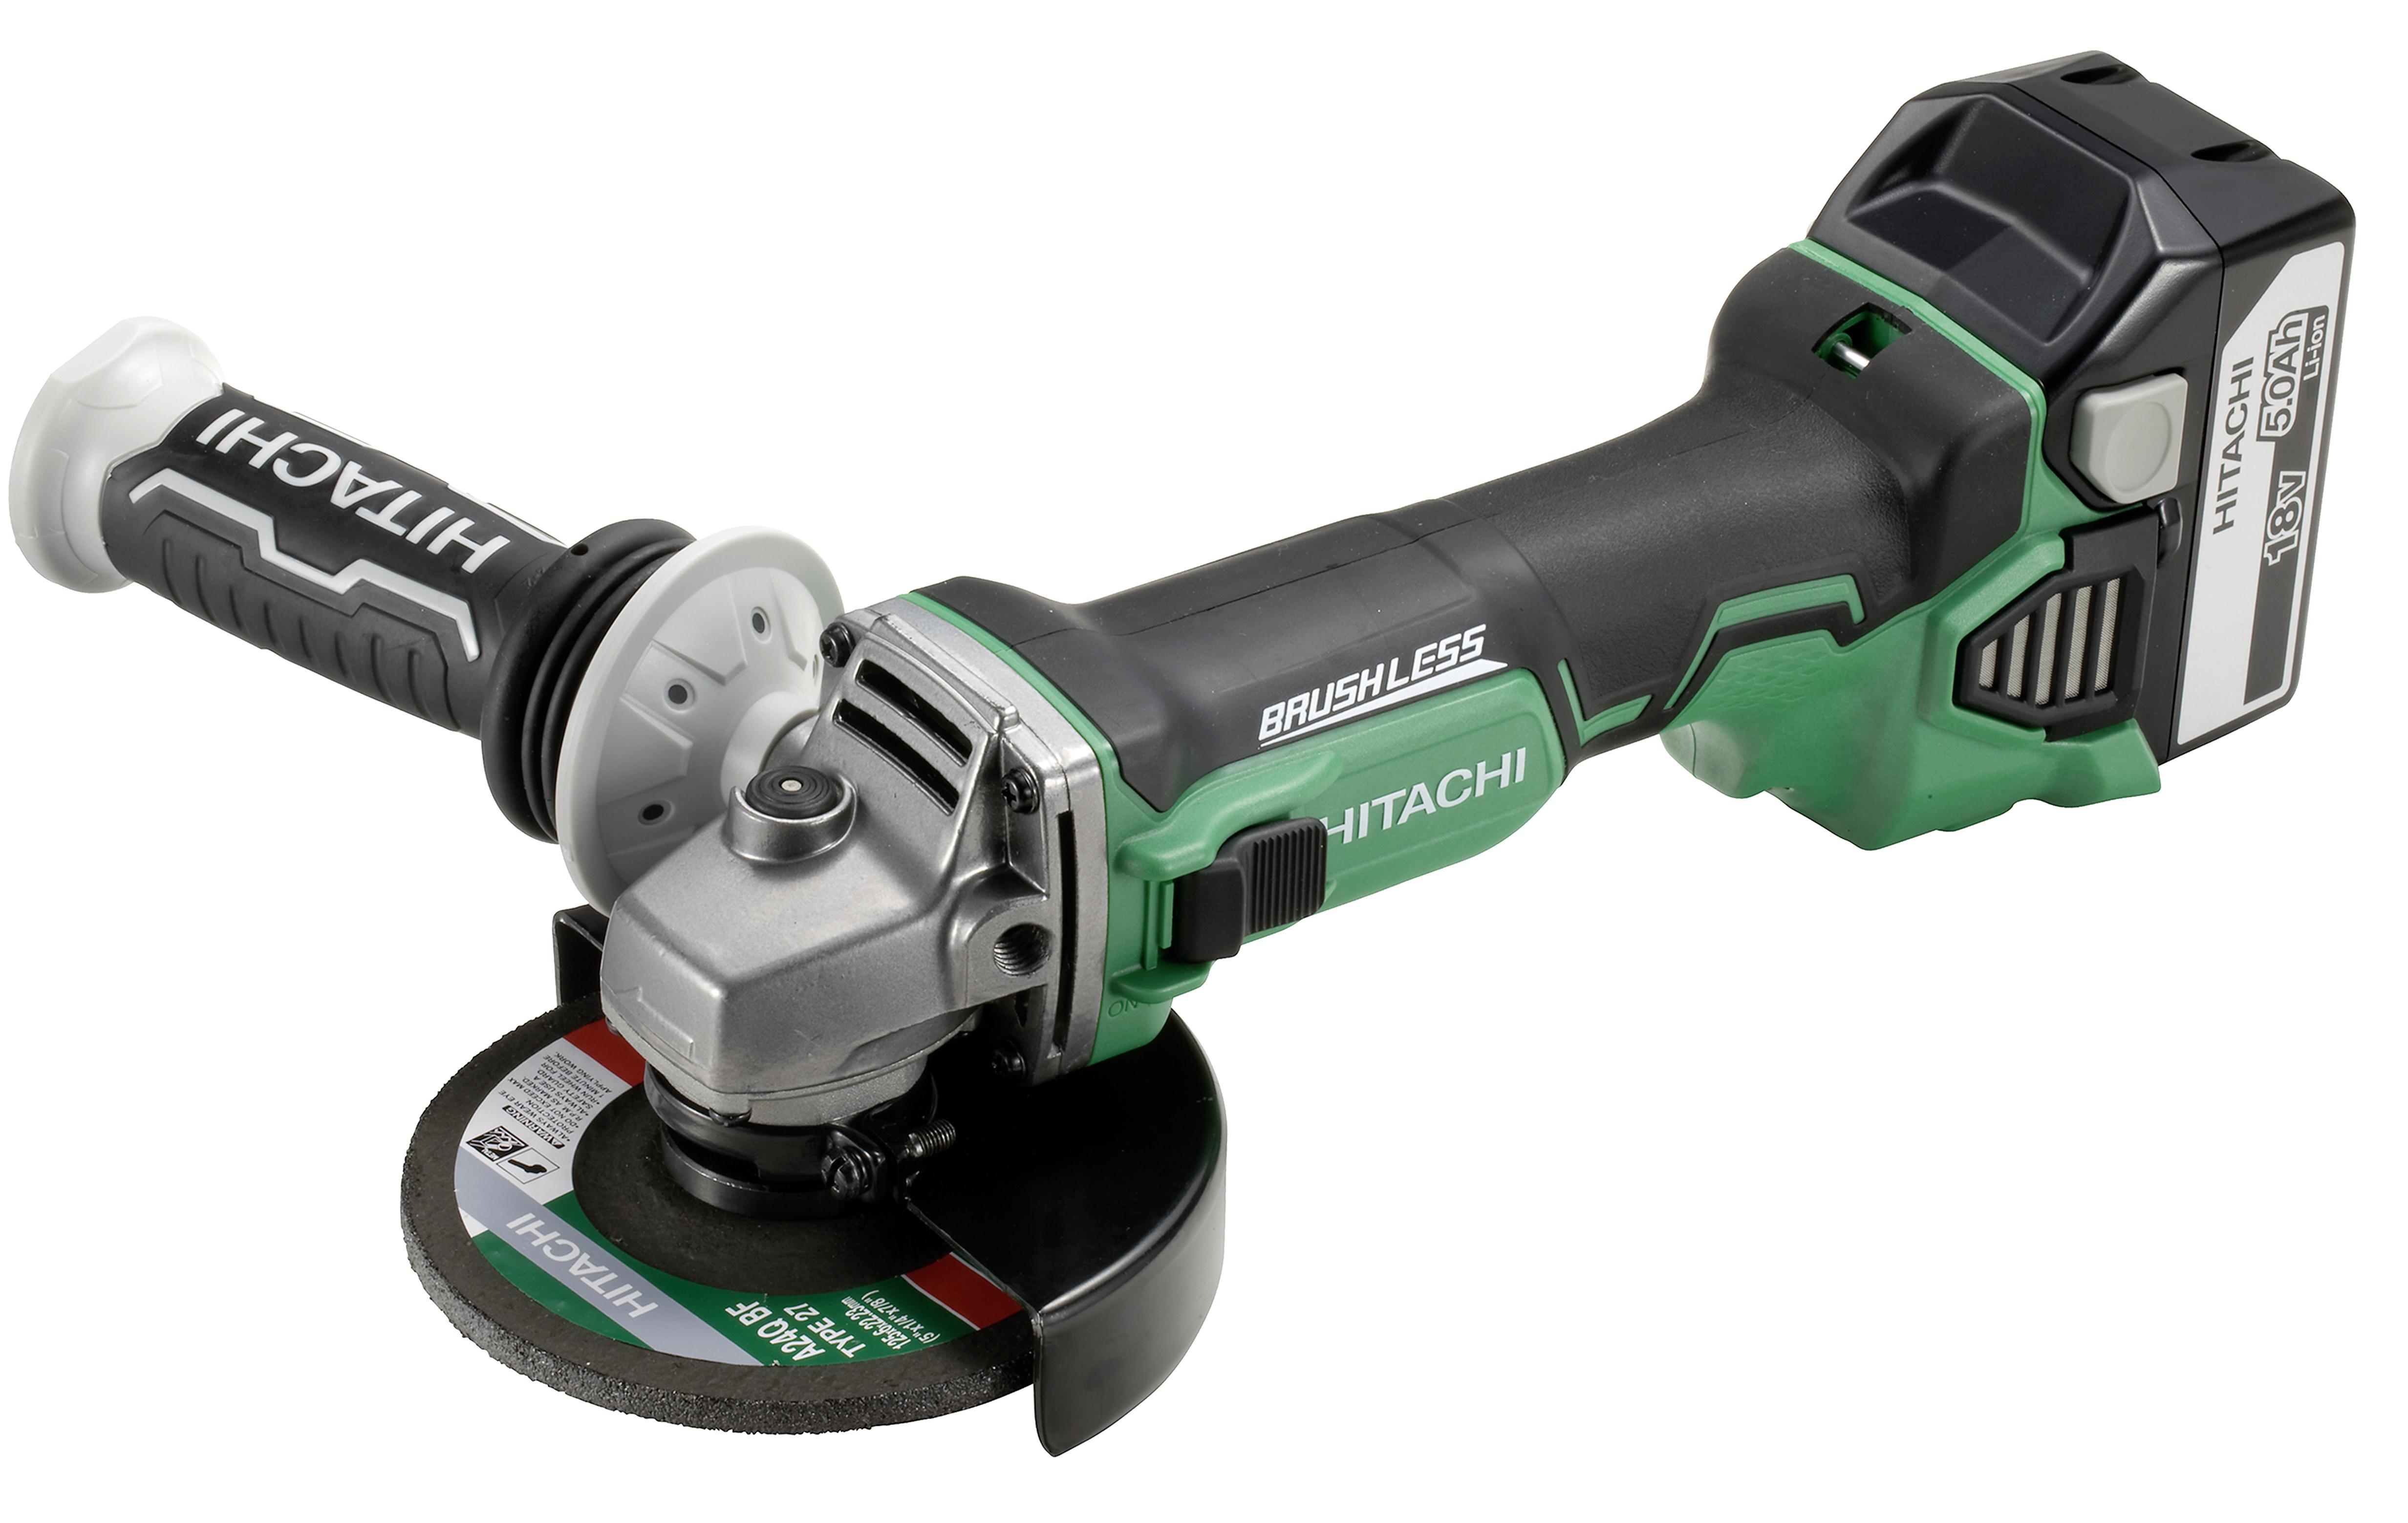 G18DBVL-Battery-grinder-125mm-18v-5_0Ah-variable-speed